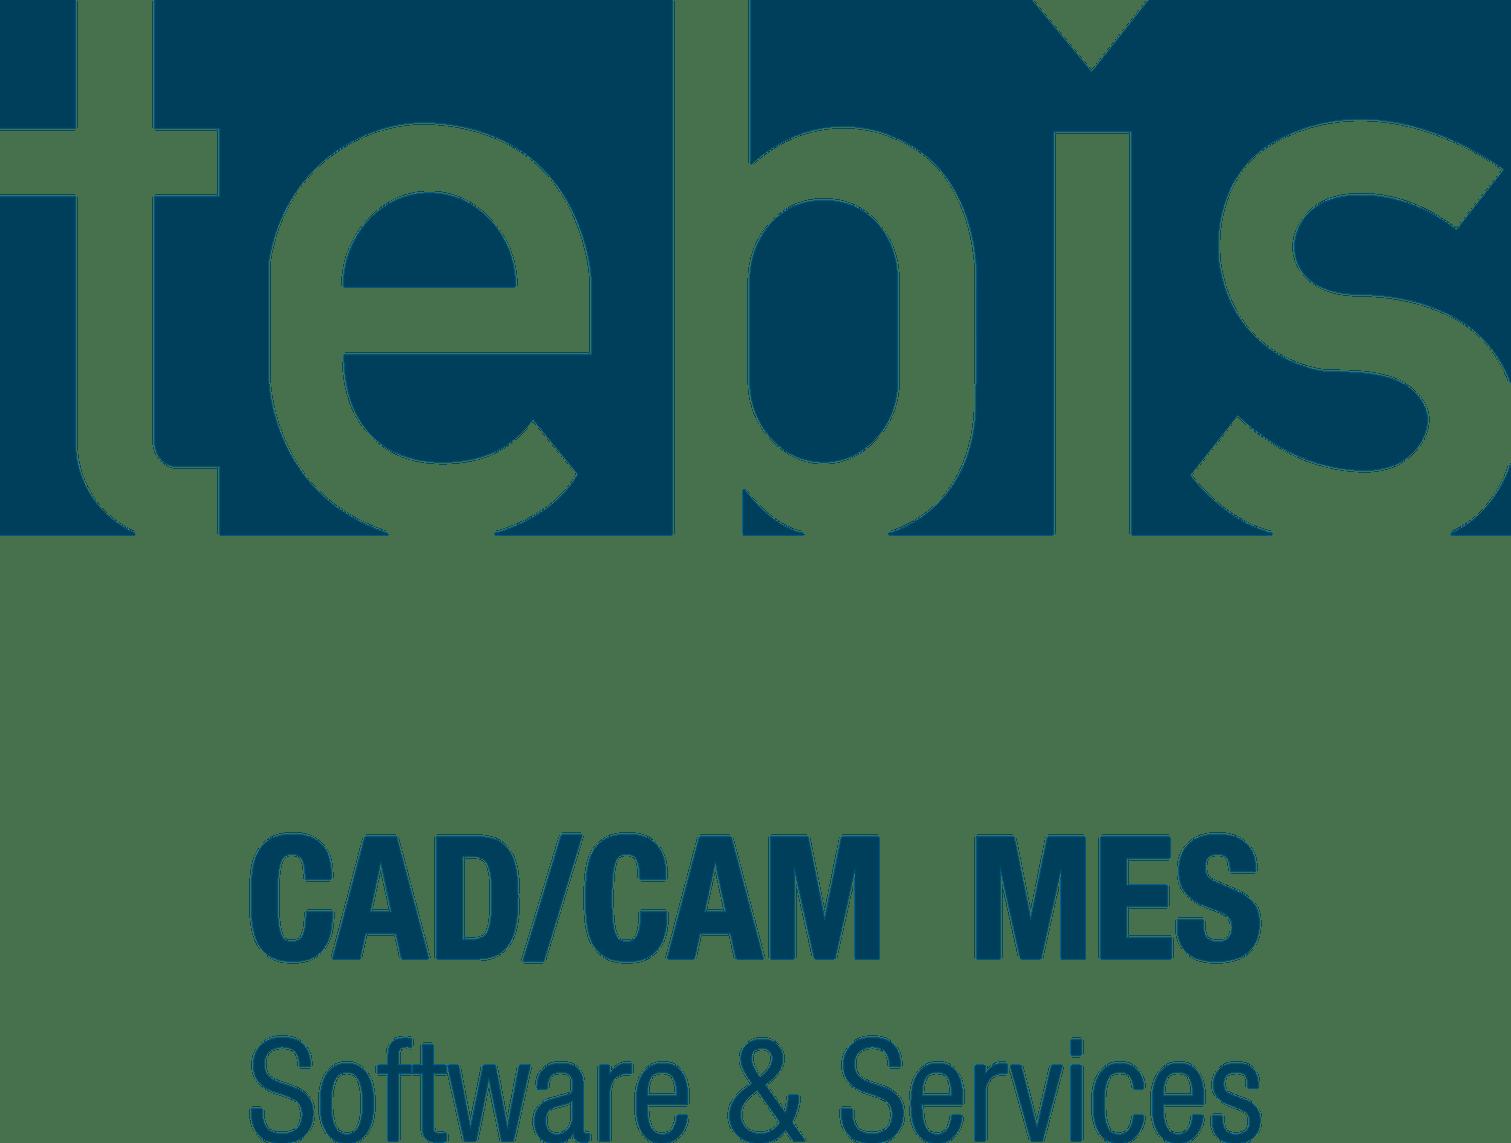 TEBIS (UK) LIMITED